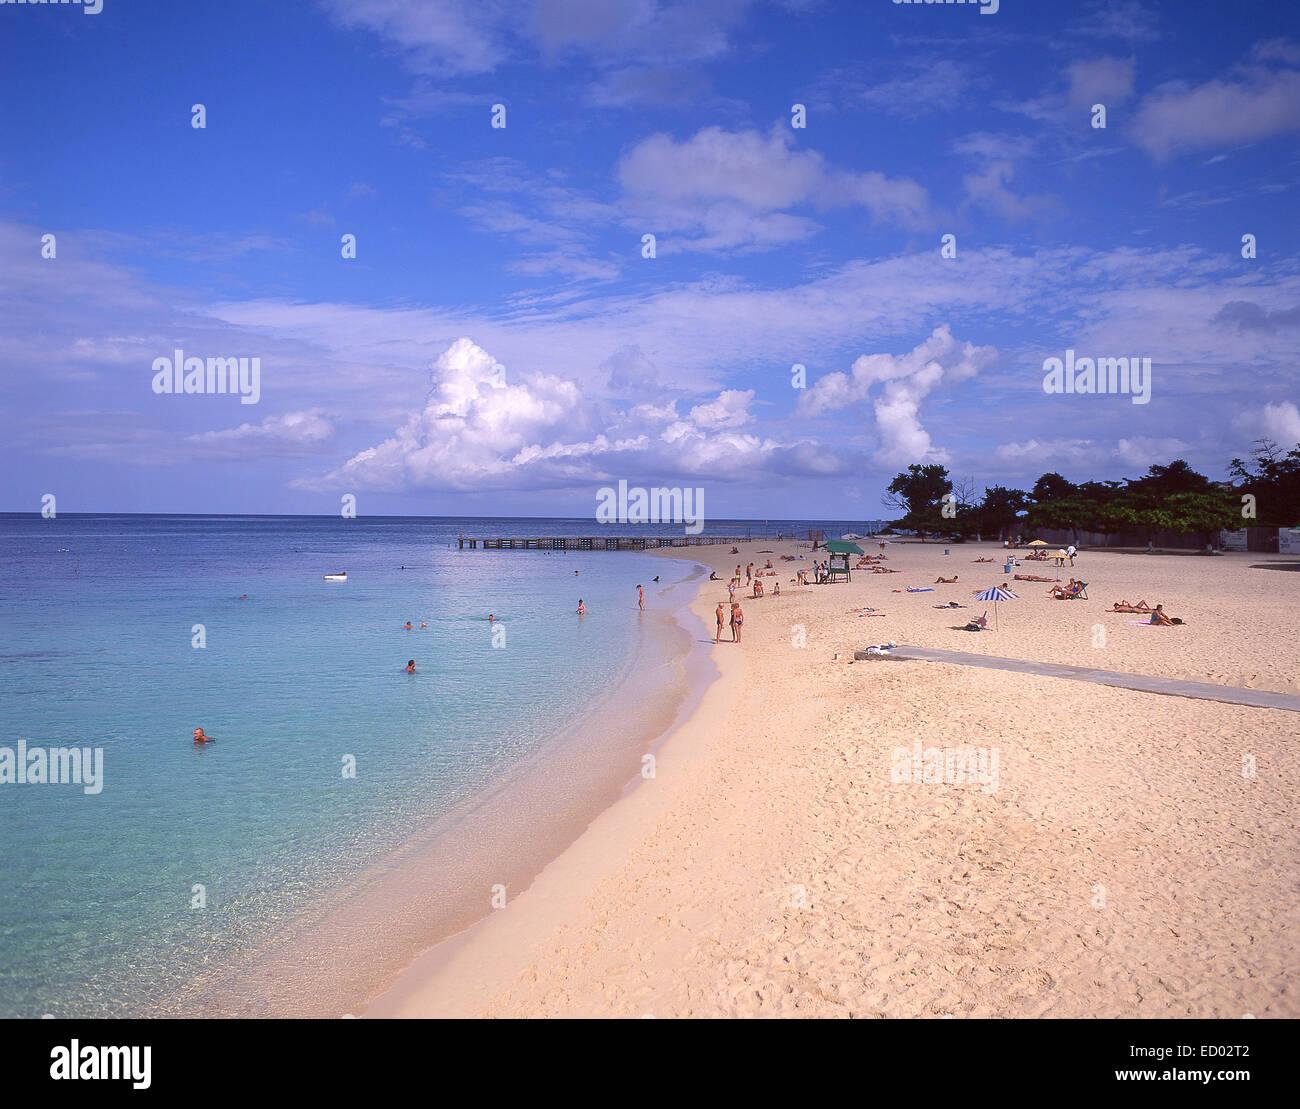 Doctor's Cave Beach Club, Montego Bay, St James Parish, Jamaica, Greater Antilles, Caribbean - Stock Image